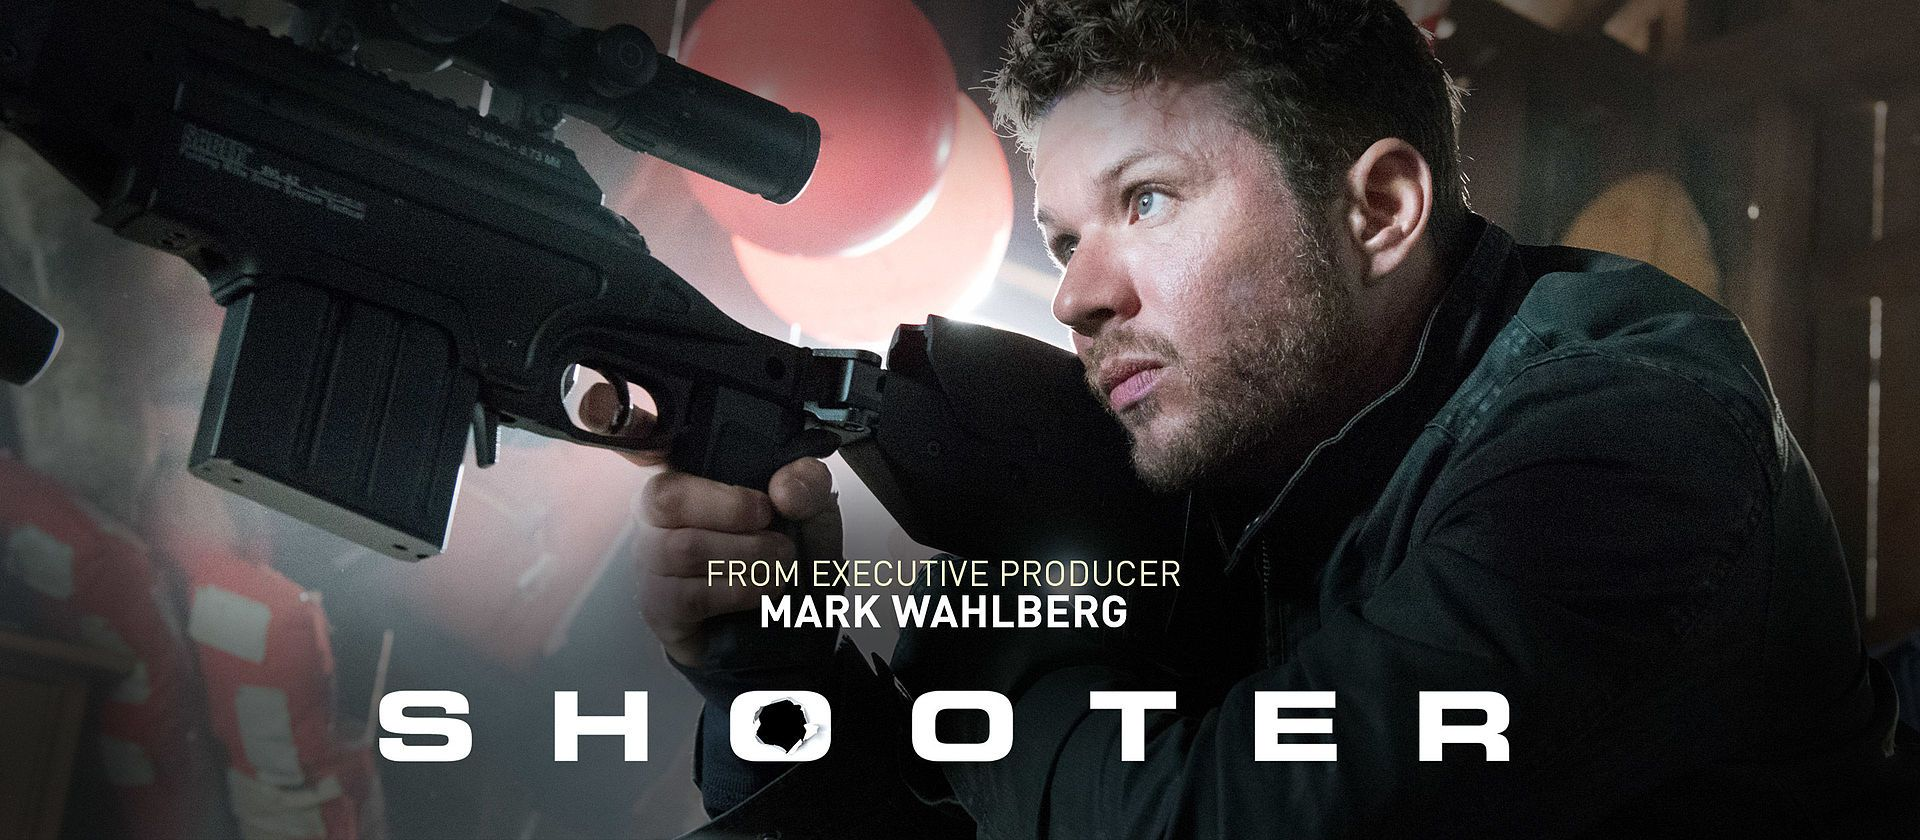 Film Shooter